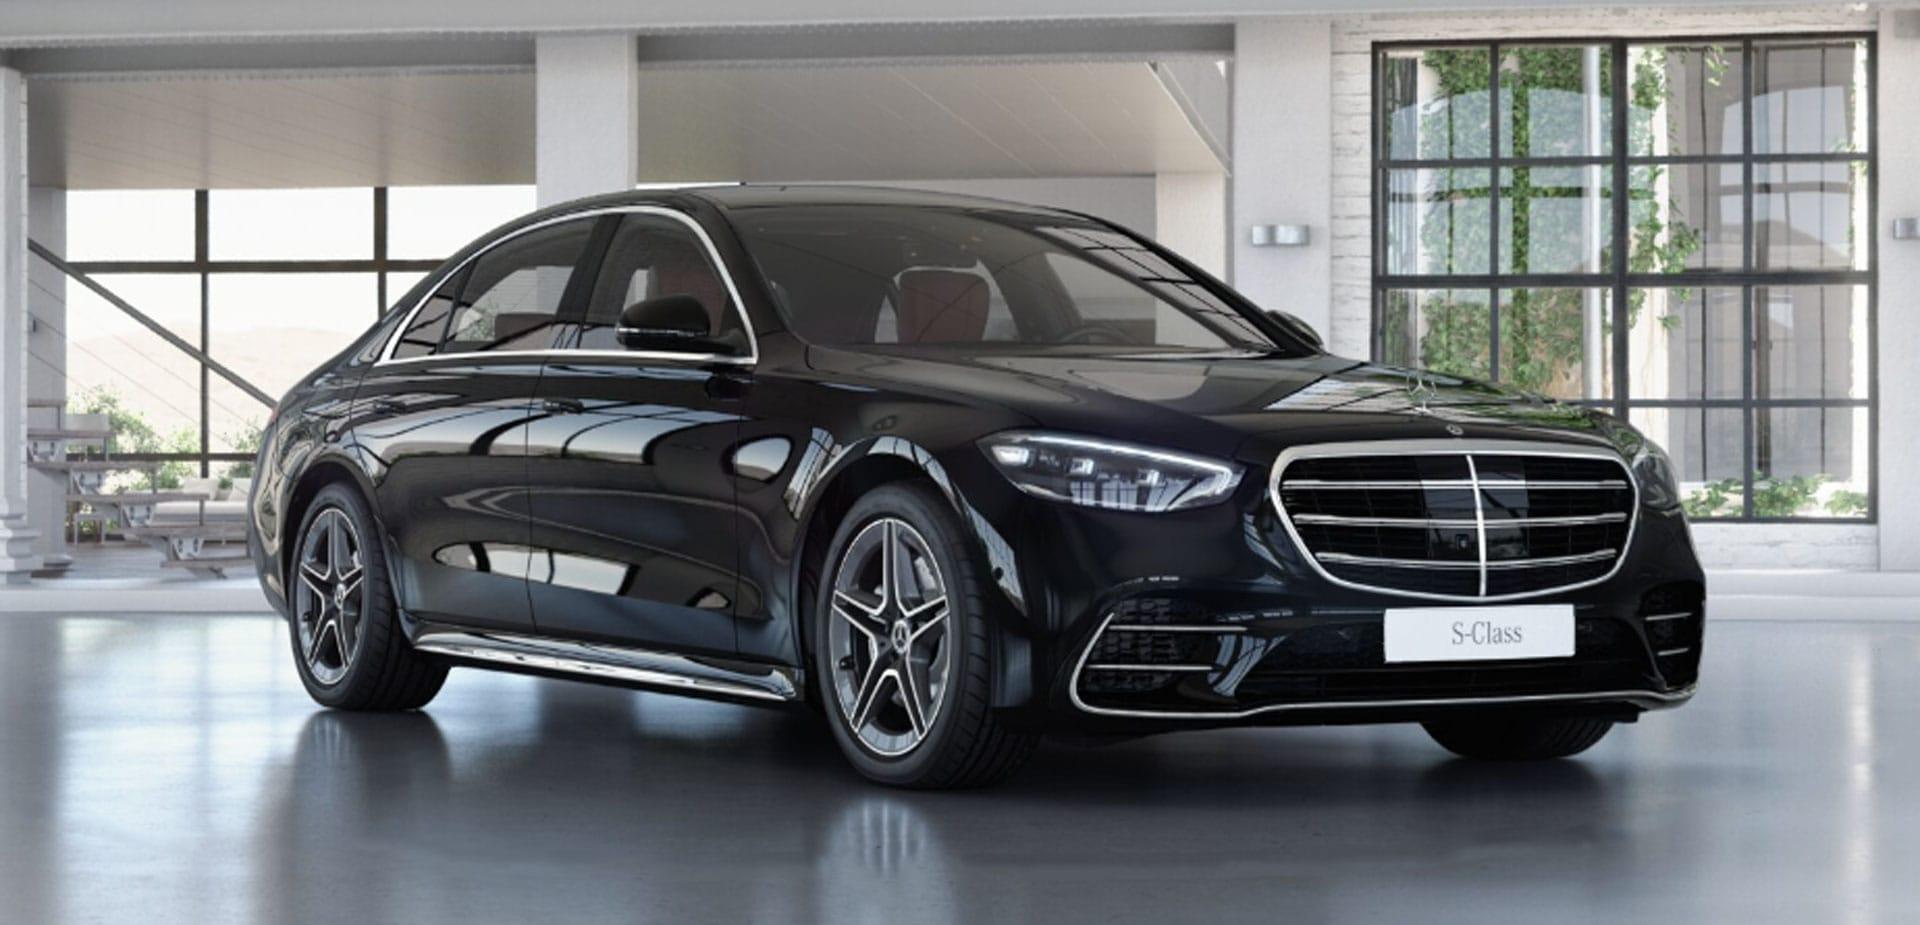 Mercedes-Benz S-Class Limousine 0152680036